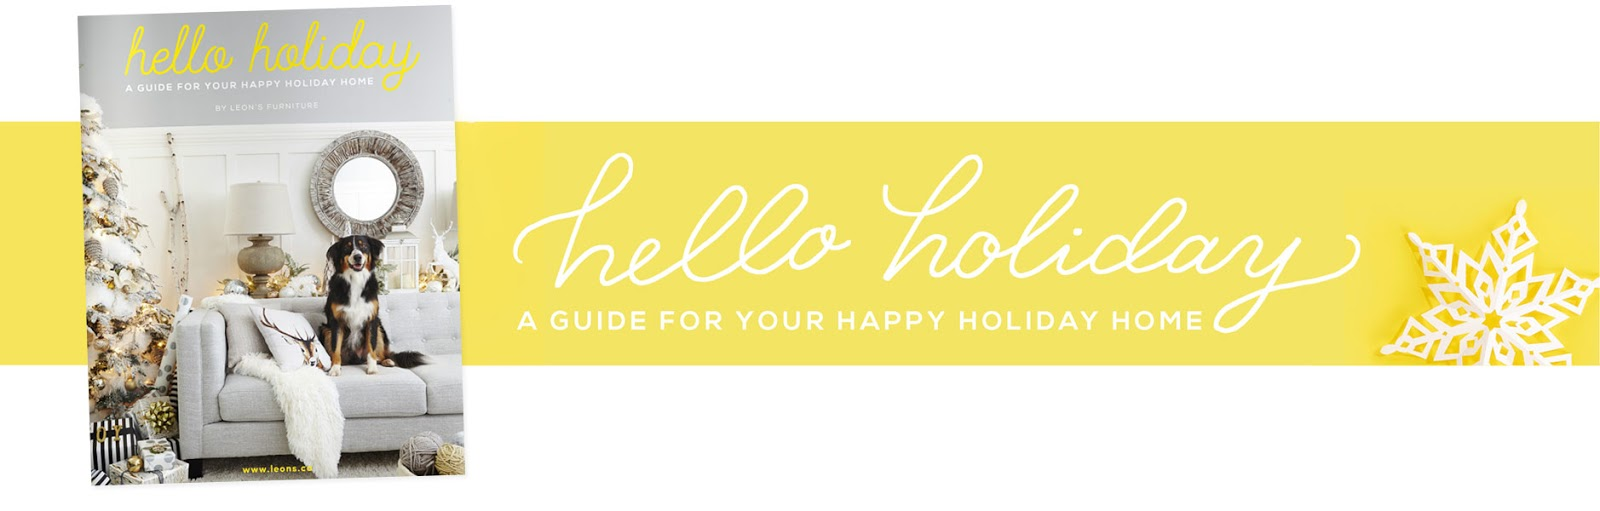 Leon's Hello Holiday Guide